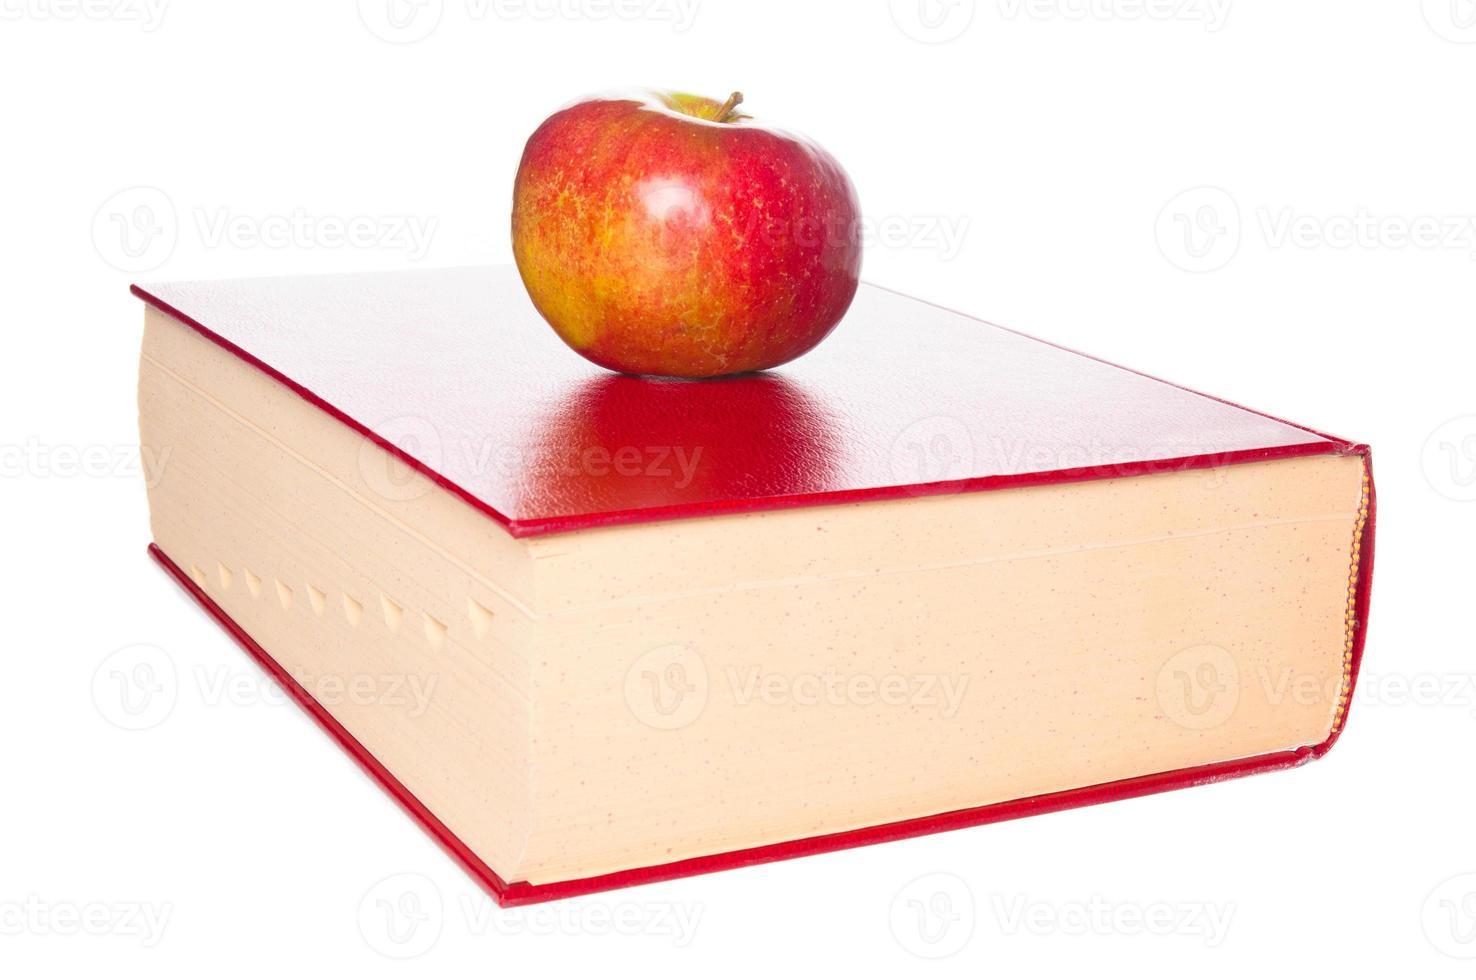 woordenboek en appelclose-up op witte achtergrond foto